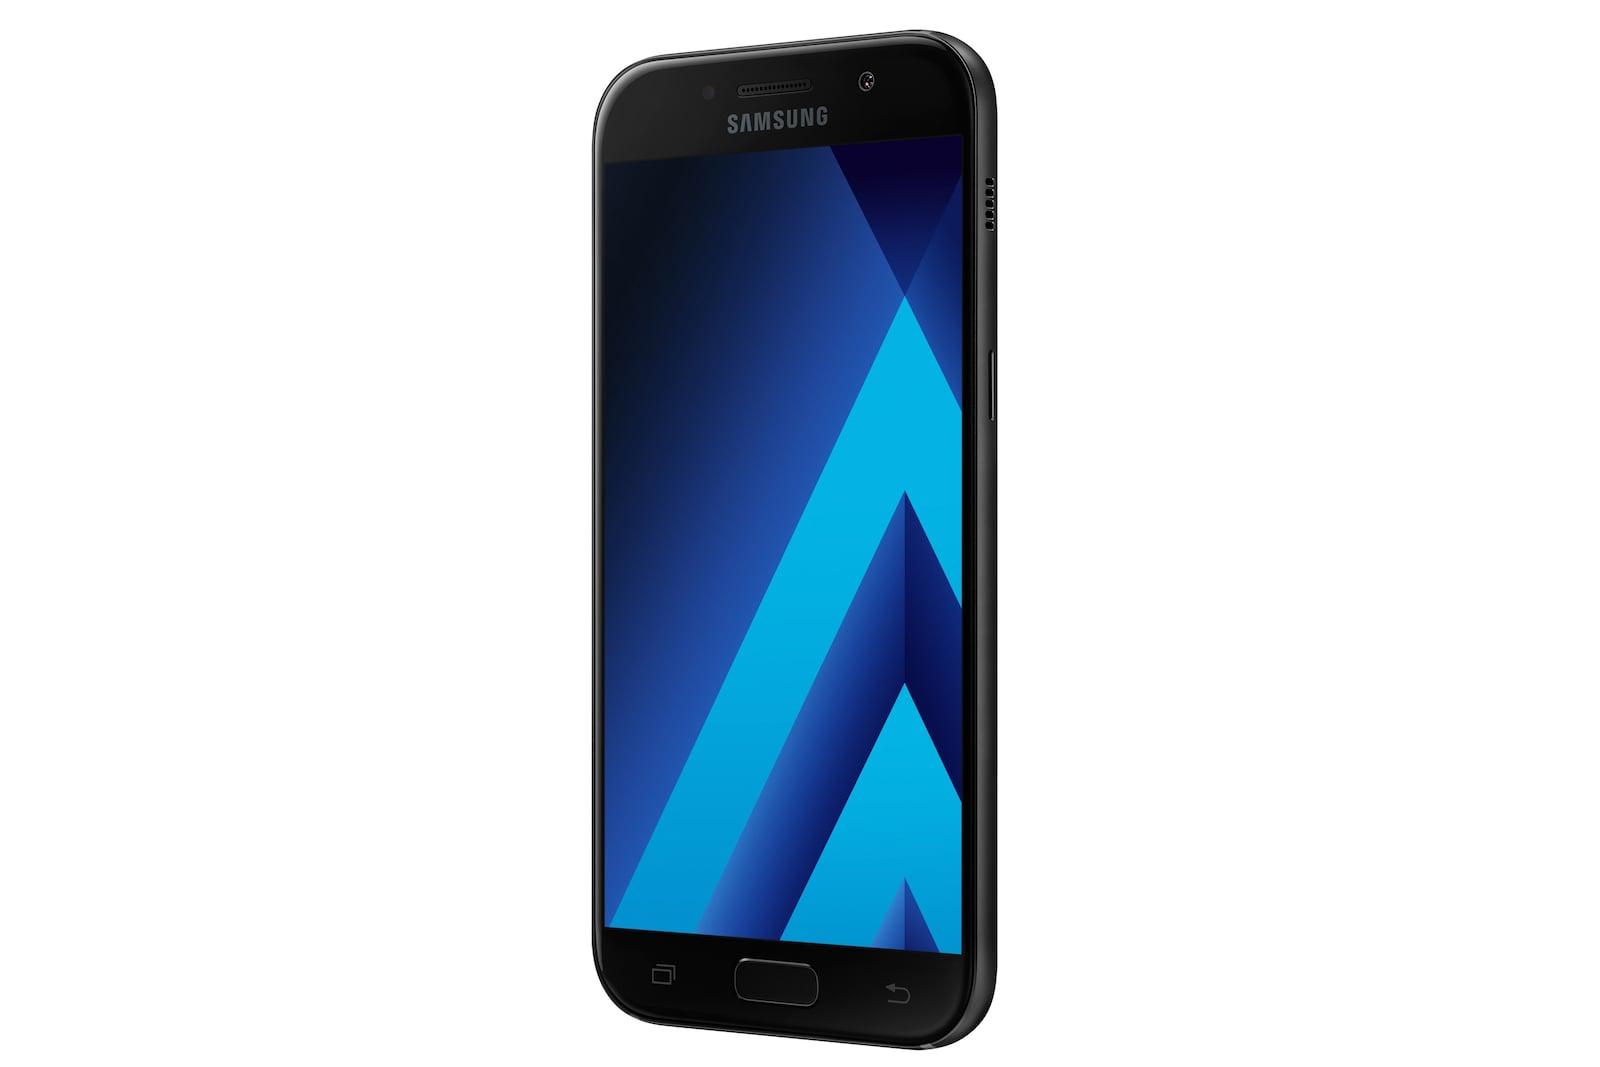 Celular Samsung Galaxy A5 SMA520F 2017 Color Negro (Telcel)